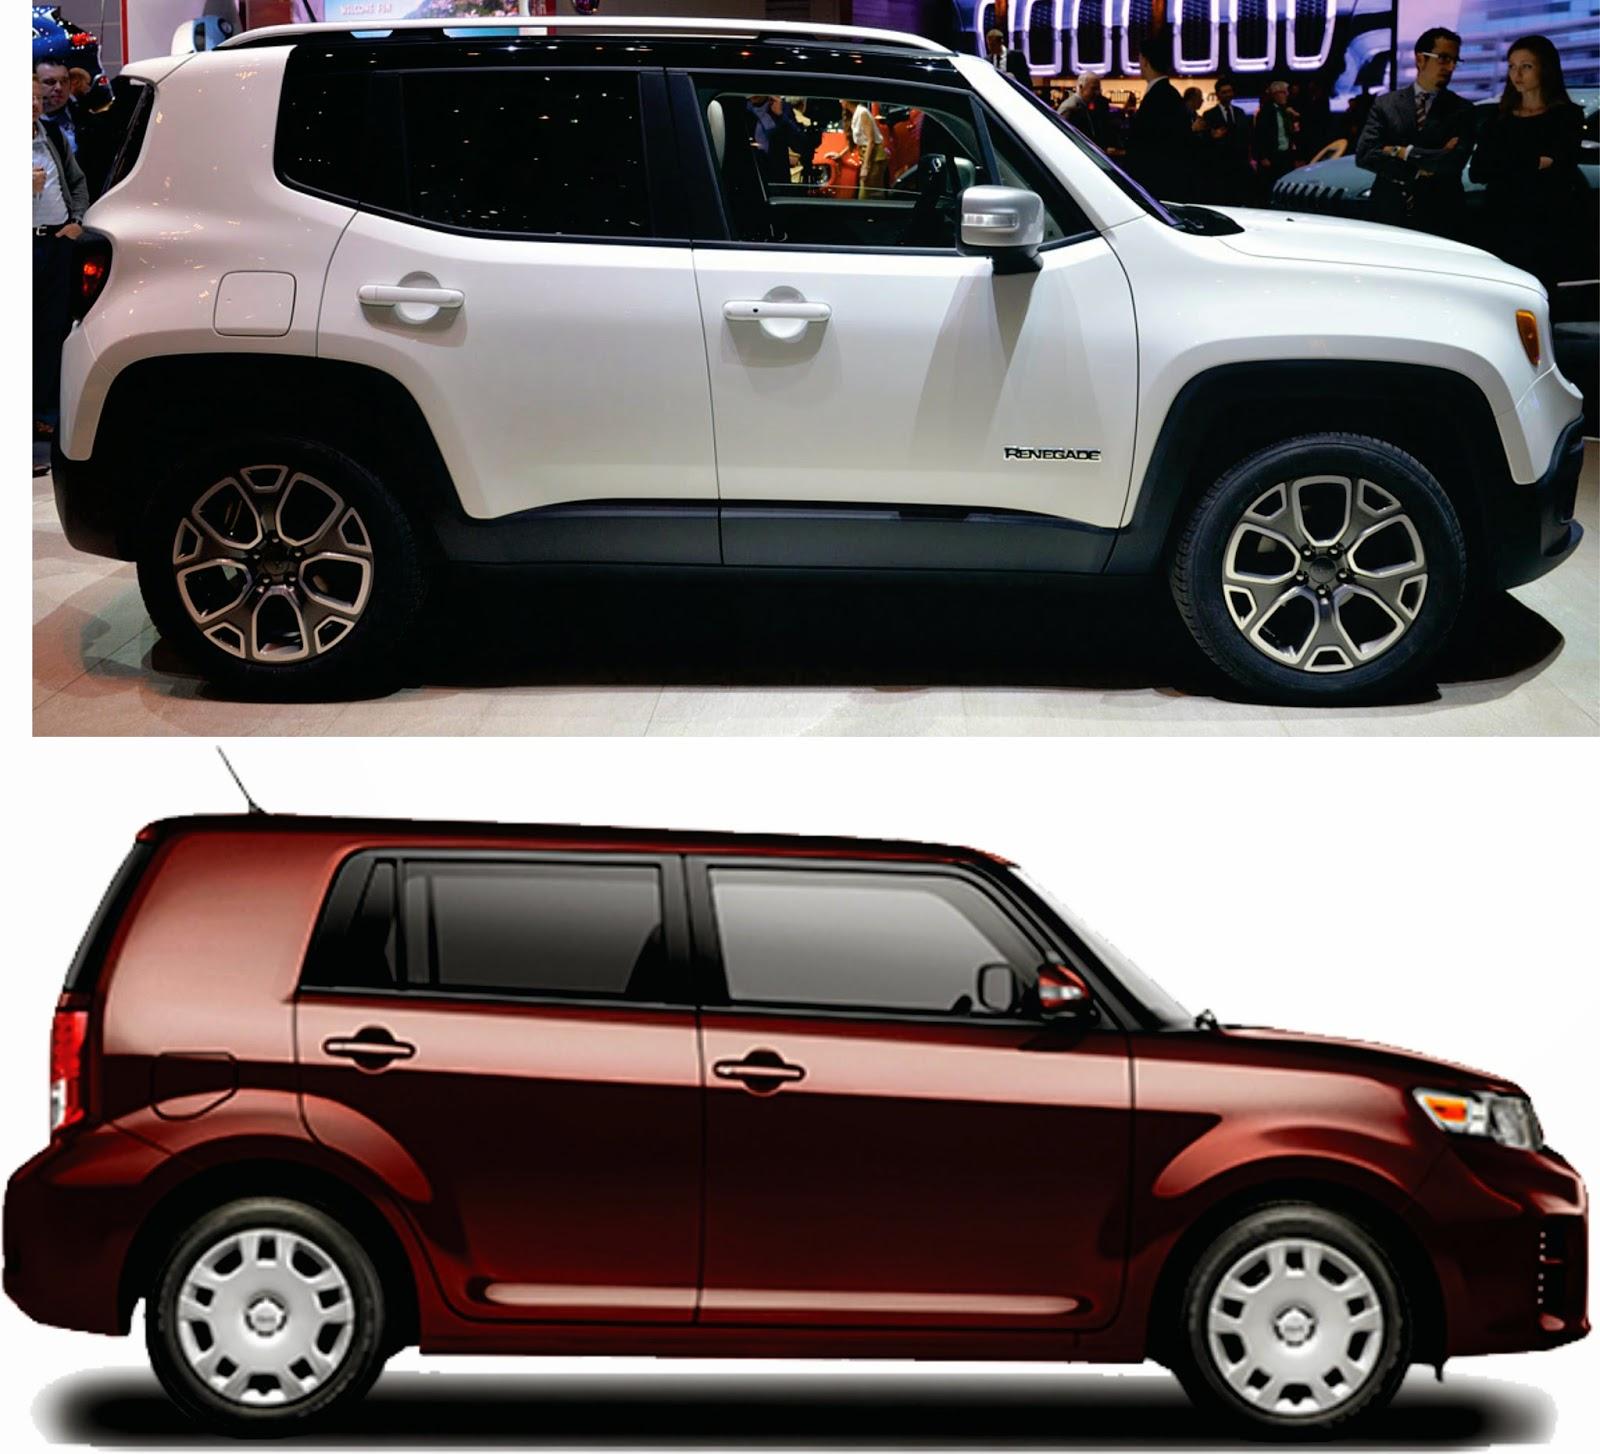 2015 Jeep Renegade Size Comparison Car Interior Design